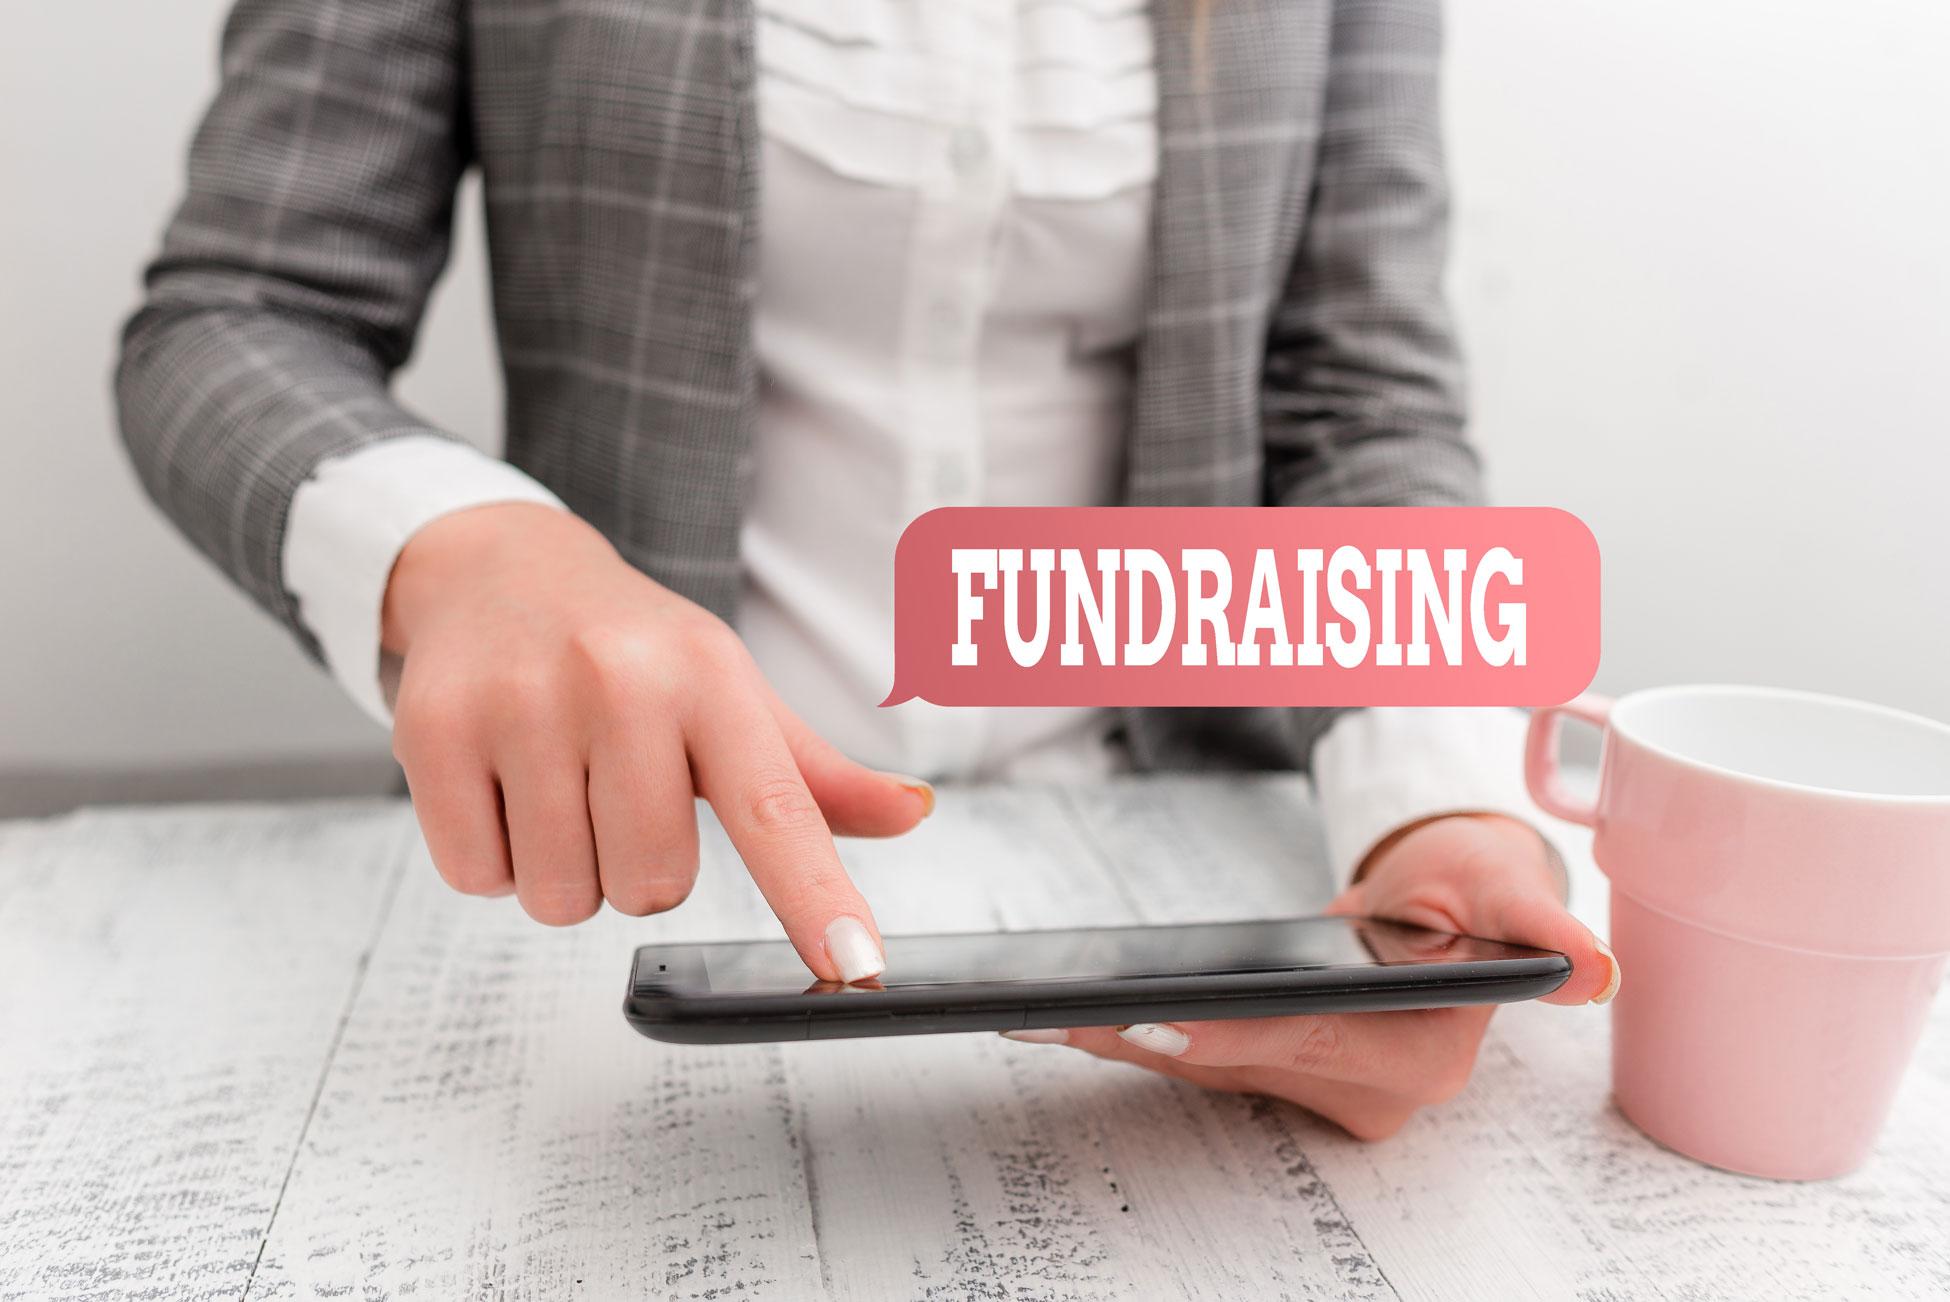 Fundraising Service